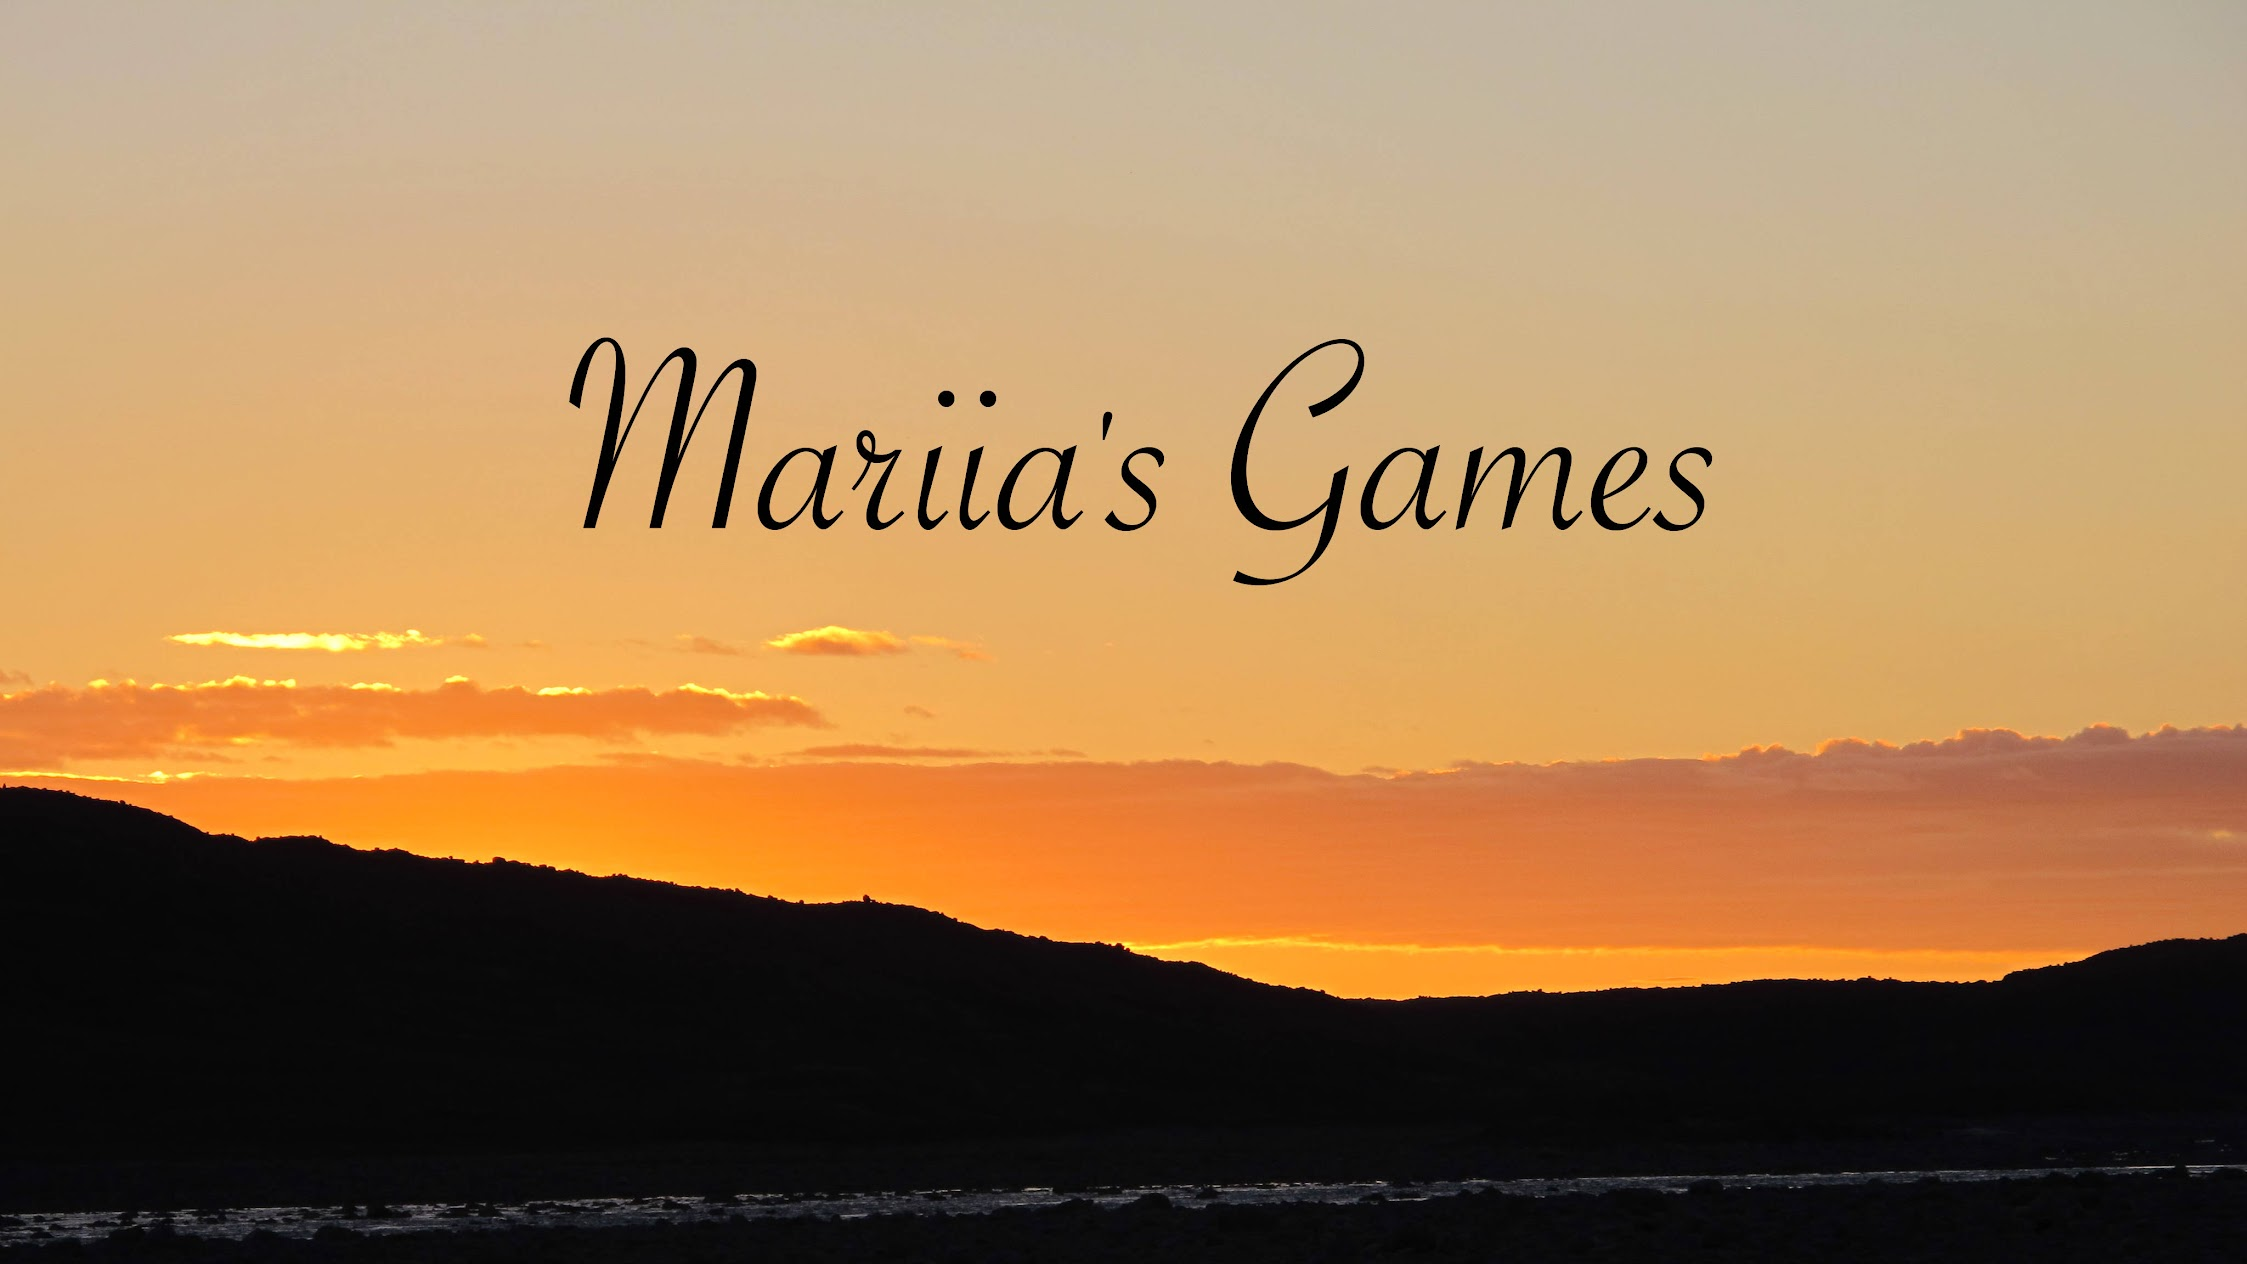 Mariias Games